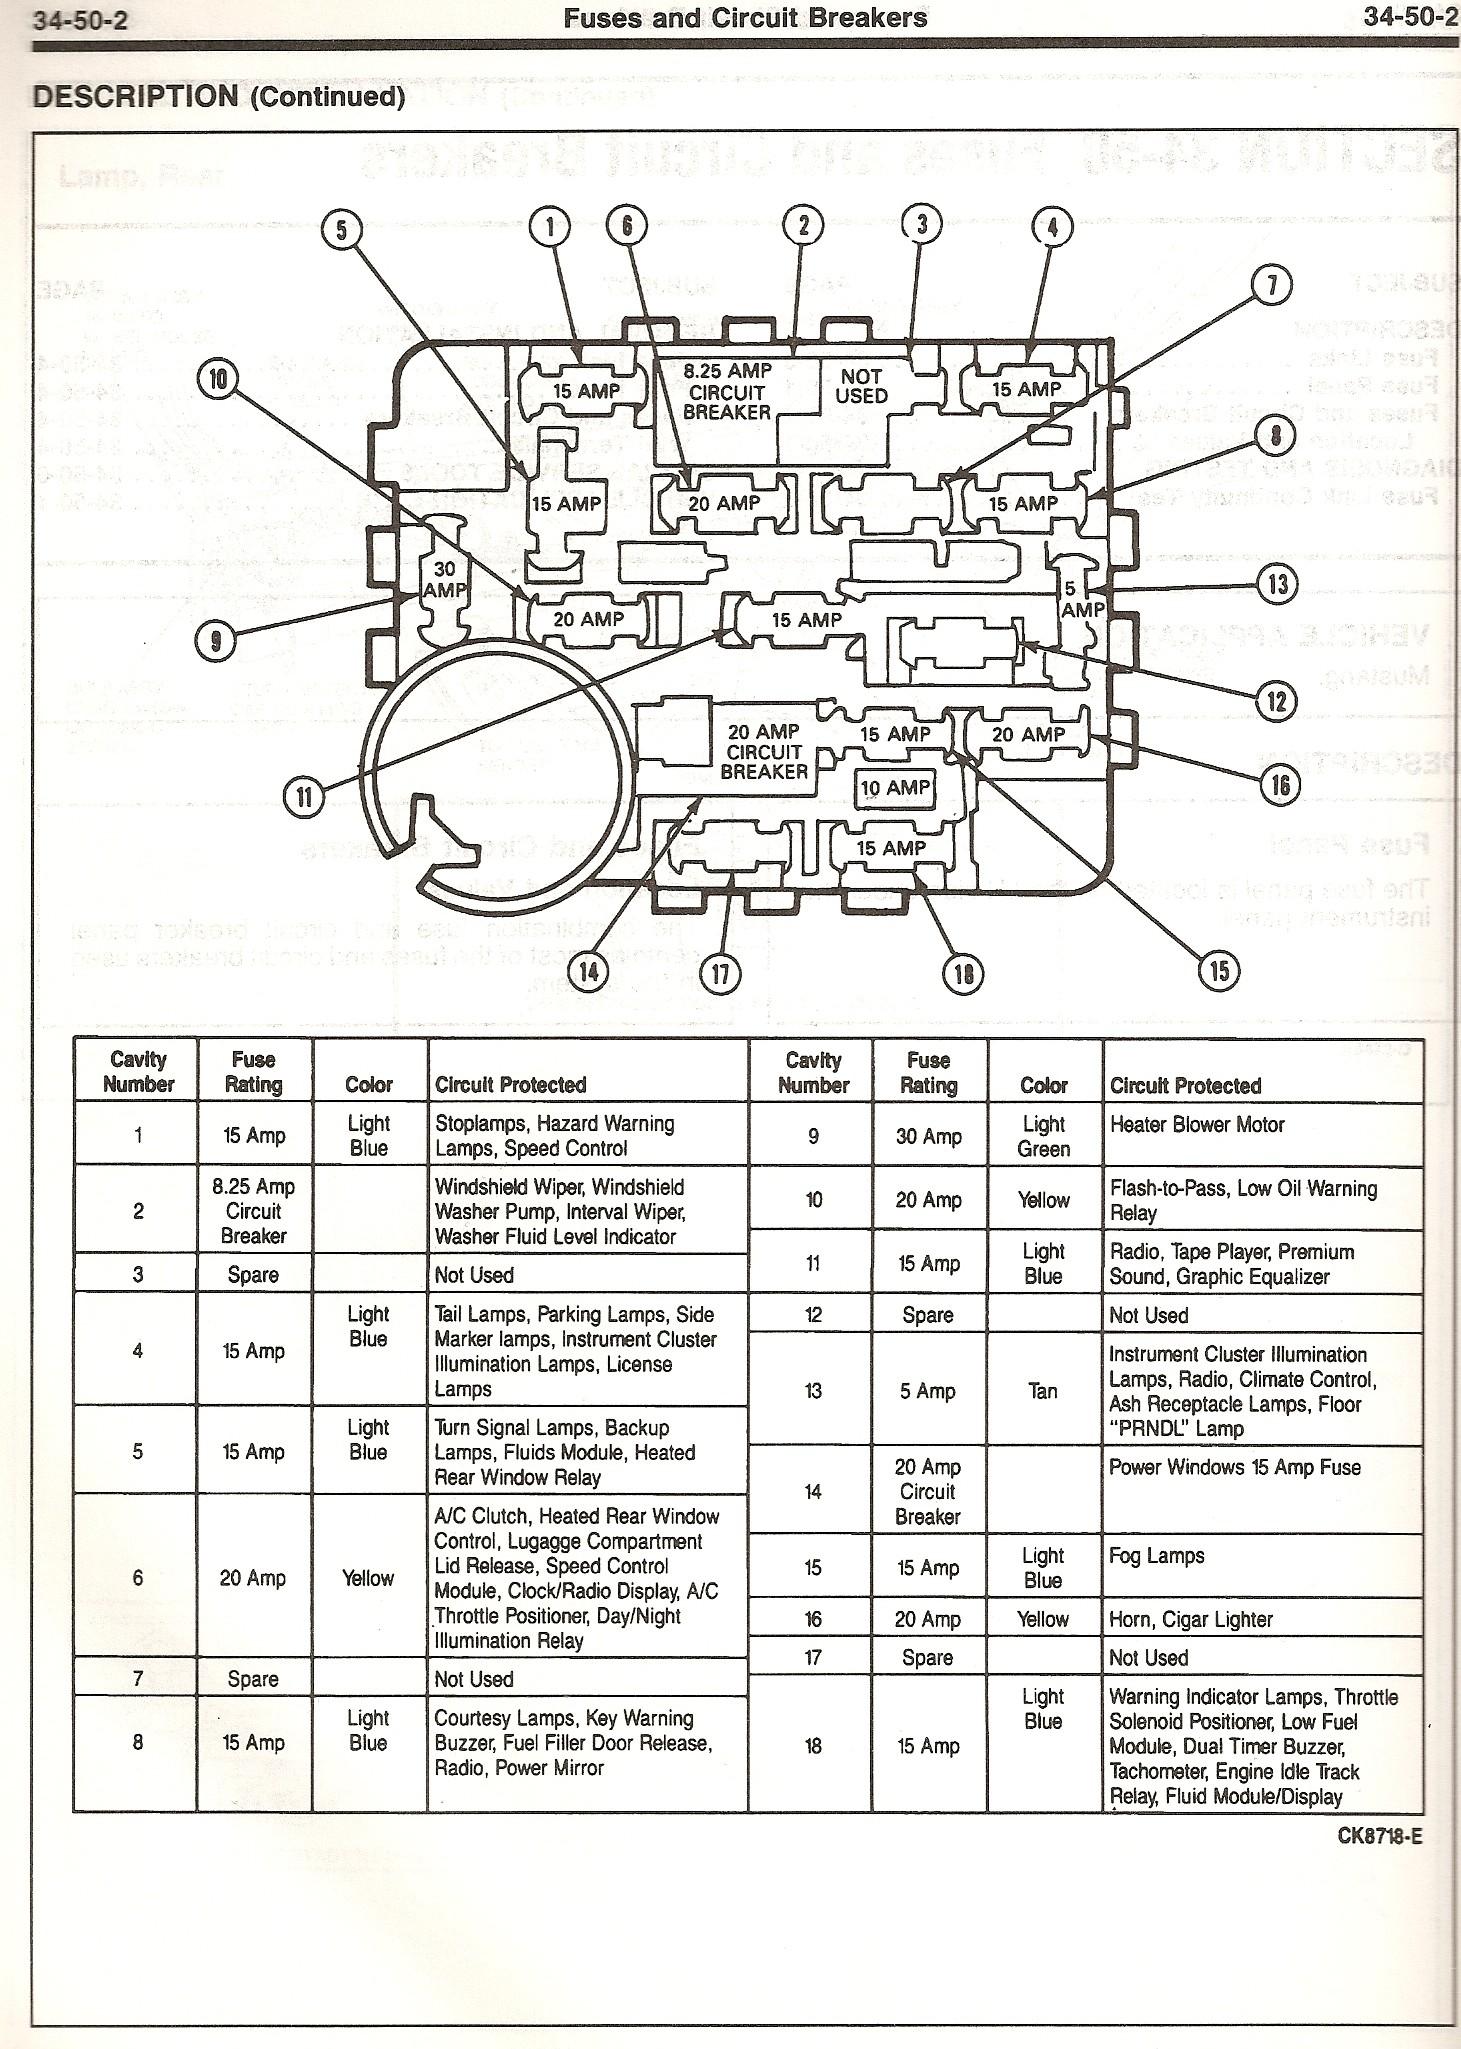 Sensational Cucv Fuse Box Diagram Wiring Library Wiring Cloud Counpengheilarigresichrocarnosporgarnagrebsunhorelemohammedshrineorg